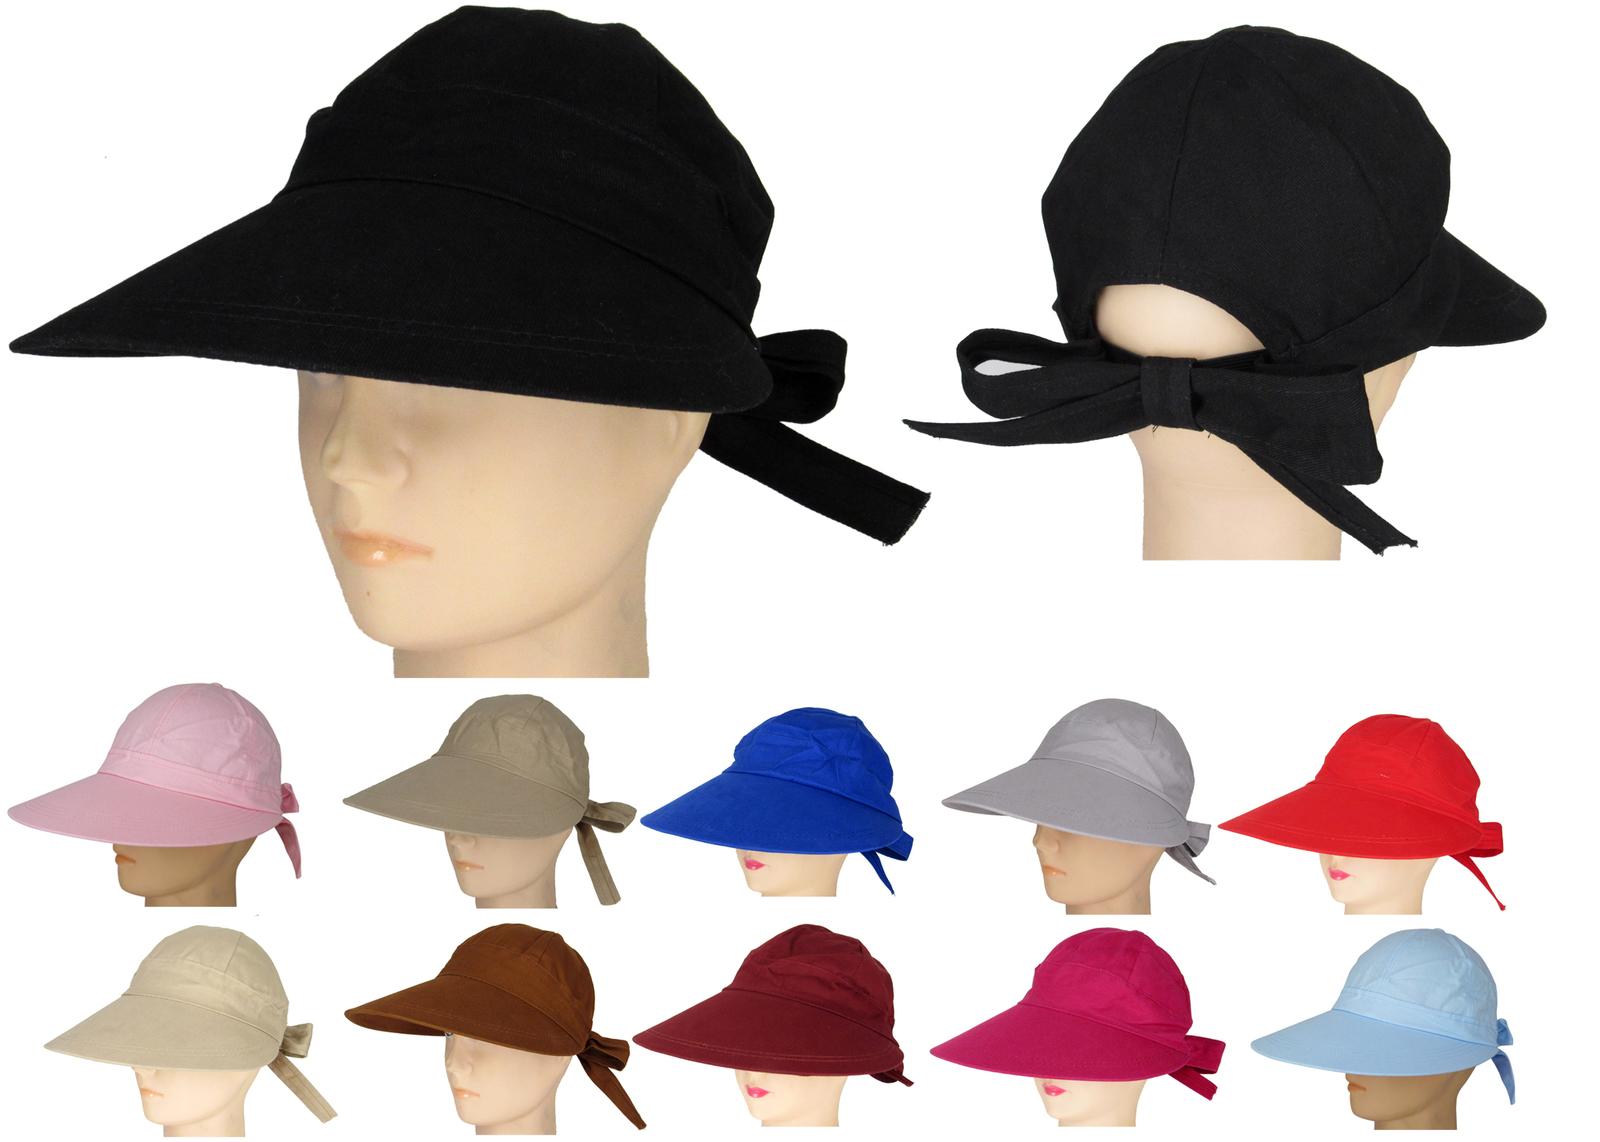 4c0a9dac5ca Women Ladies Summer Framer Large Visor Hat and 23 similar items. Untitled 1